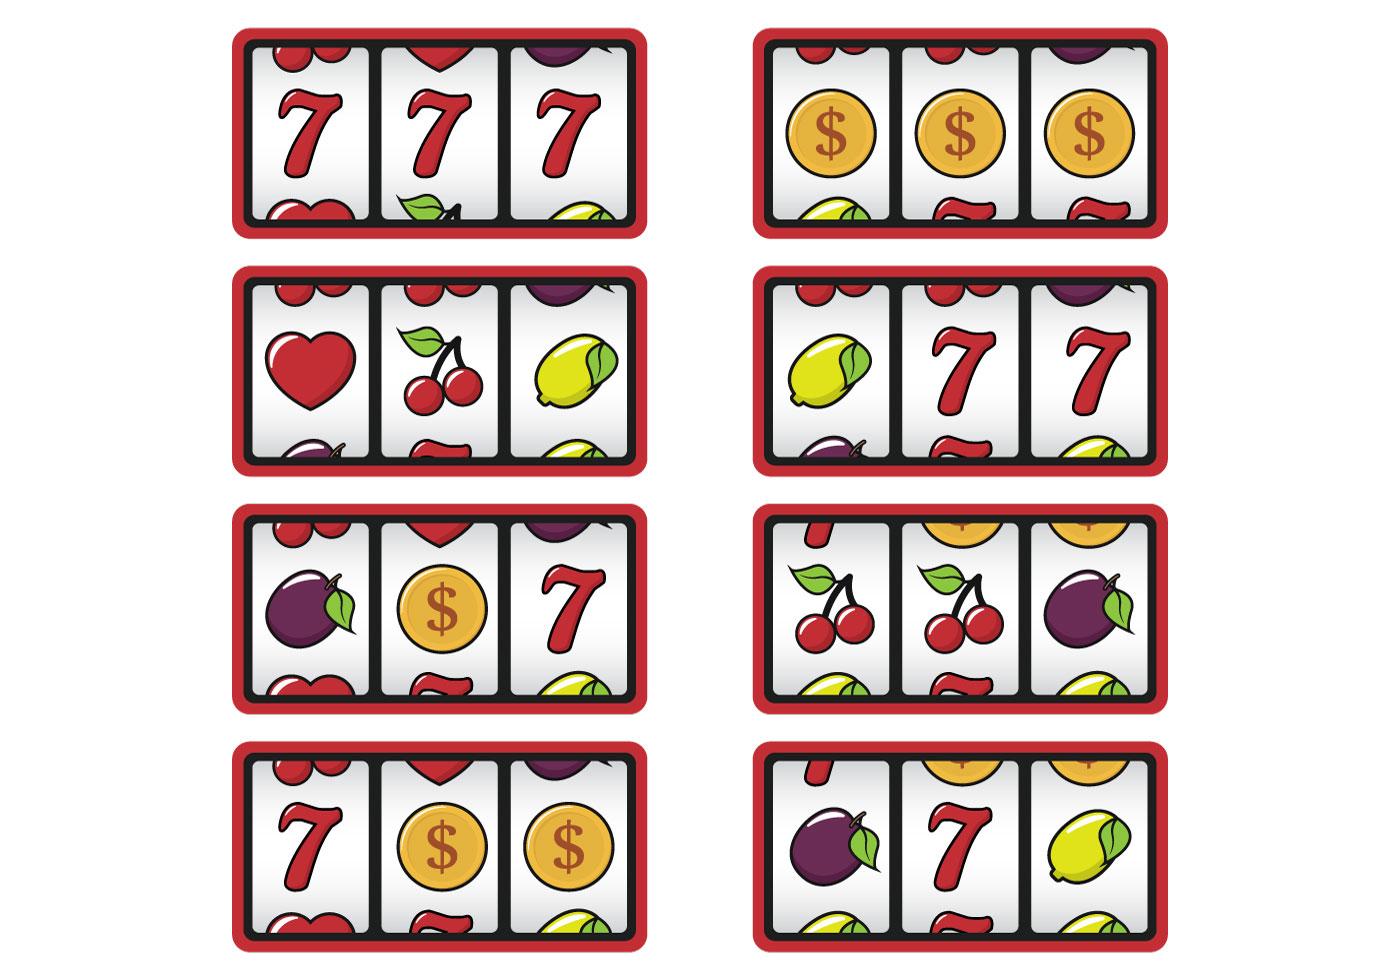 Slot Machine Display Download Free Vector Art Stock